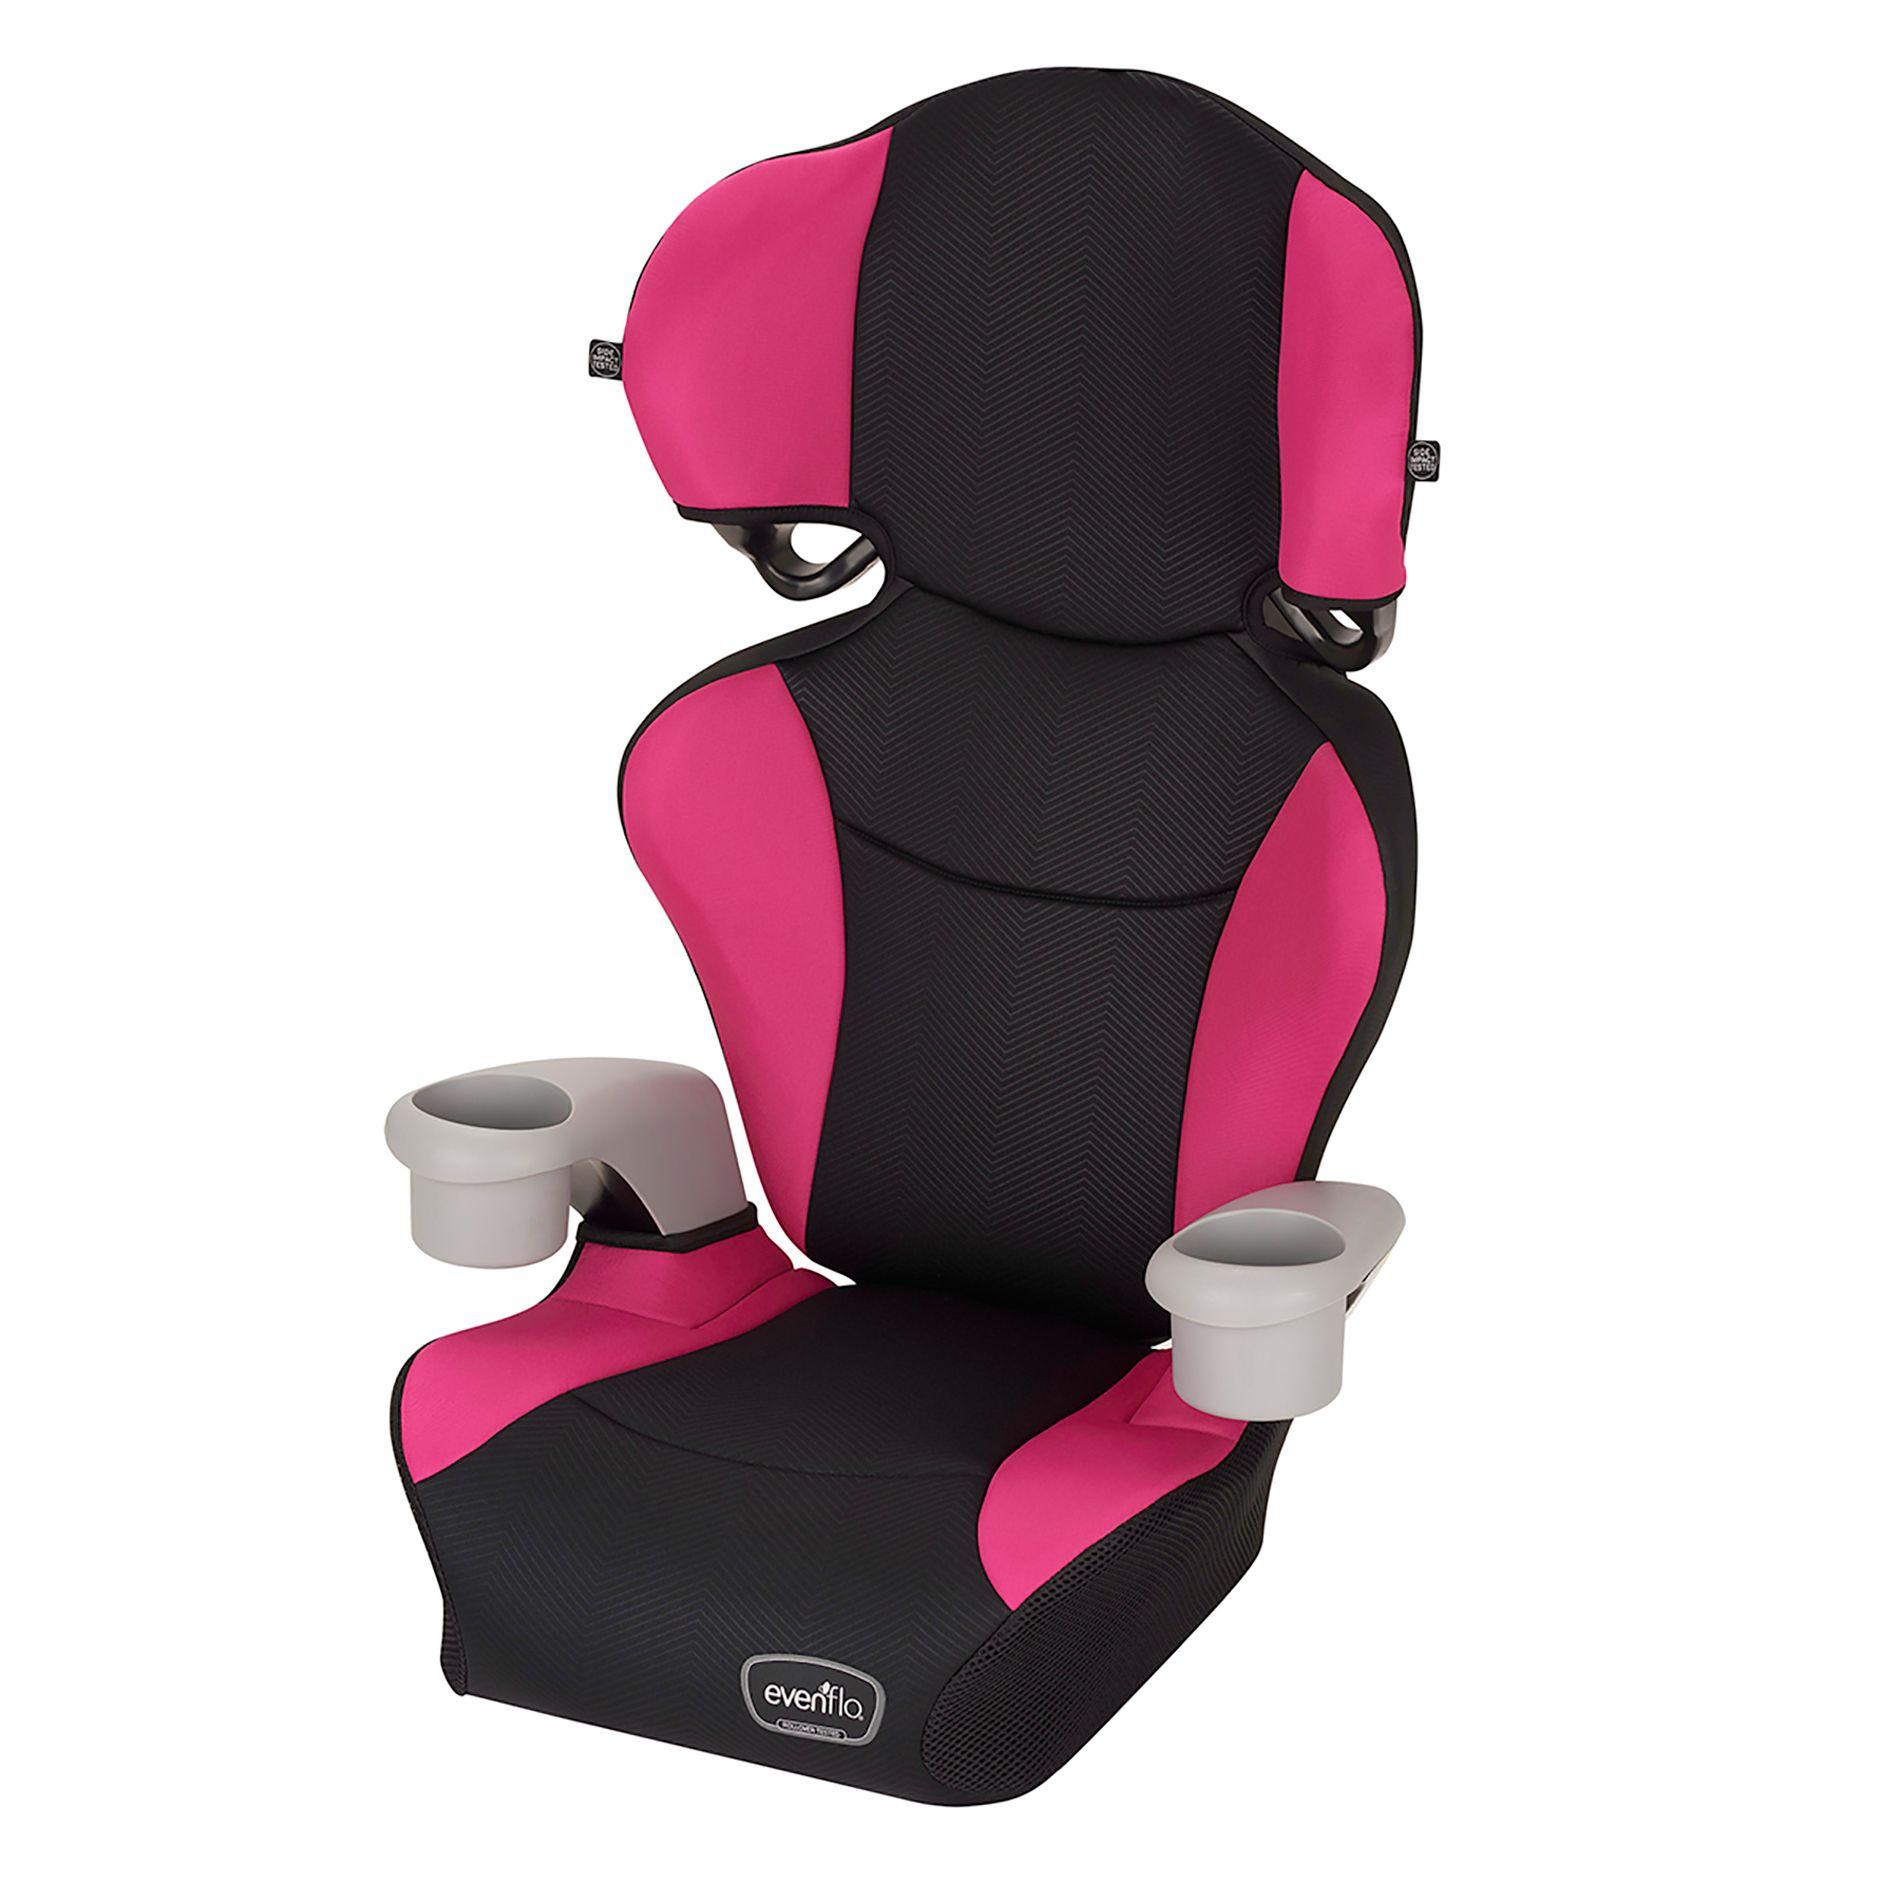 Evenflo Big Kid Sport High Back Booster Seat Pink With Images Booster Car Seat Car Seats Evenflo